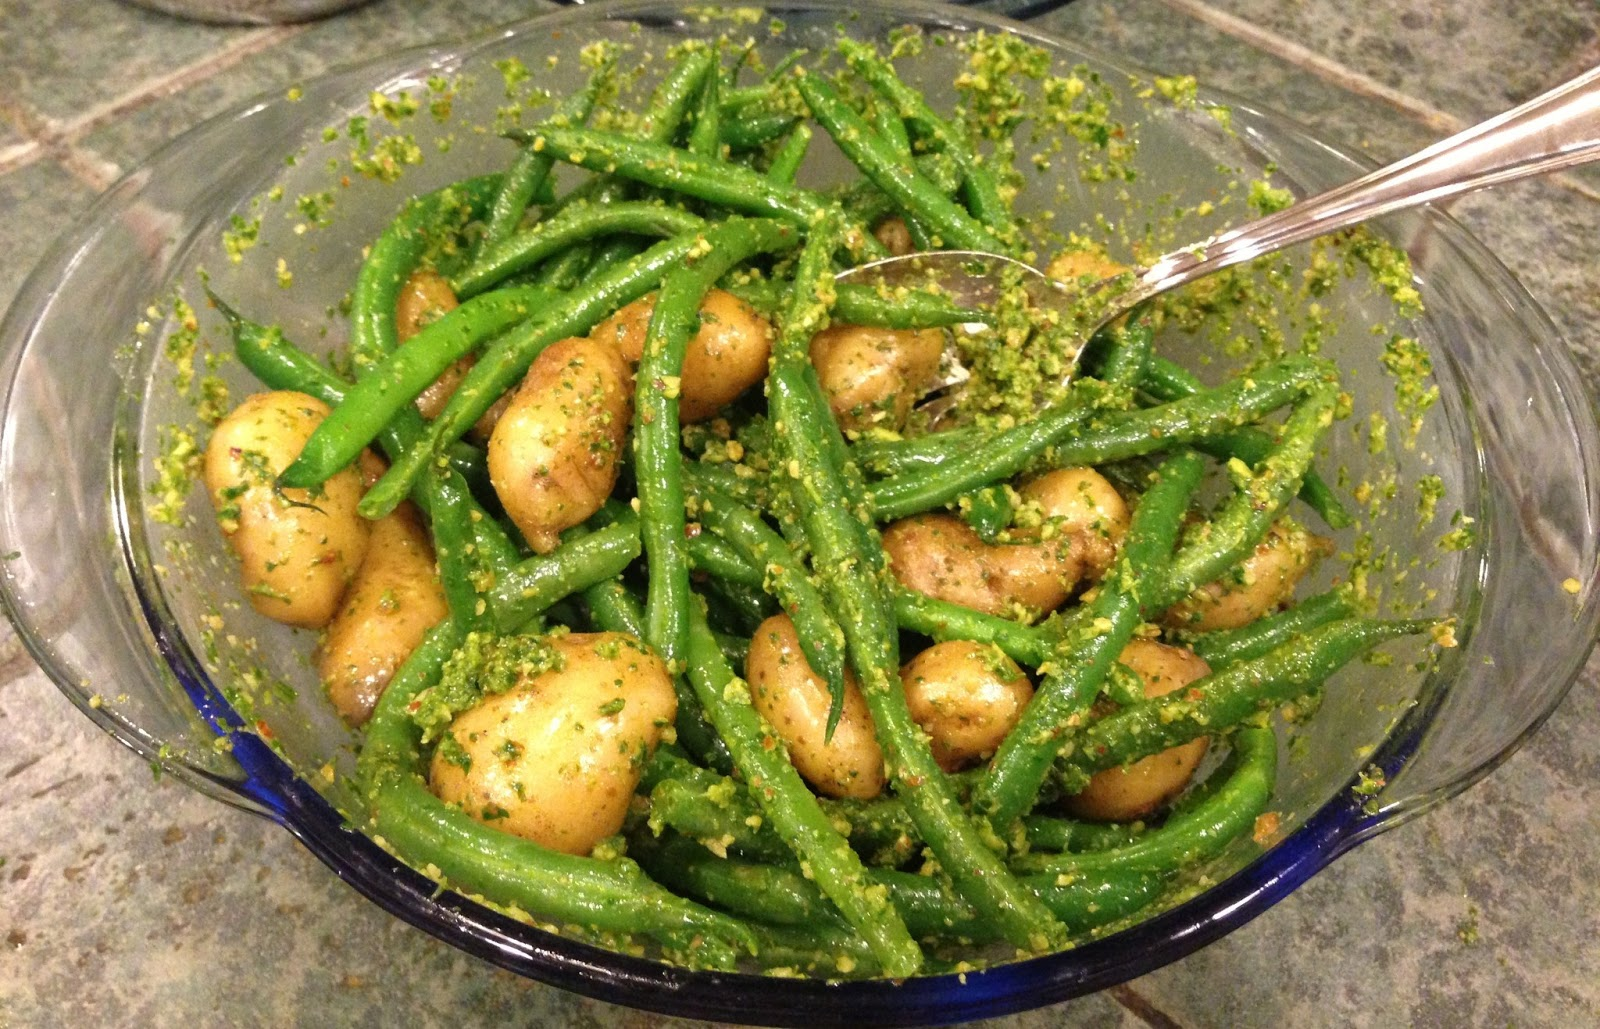 Potato And Green Bean Salad With Arugula Pesto Recipe ...